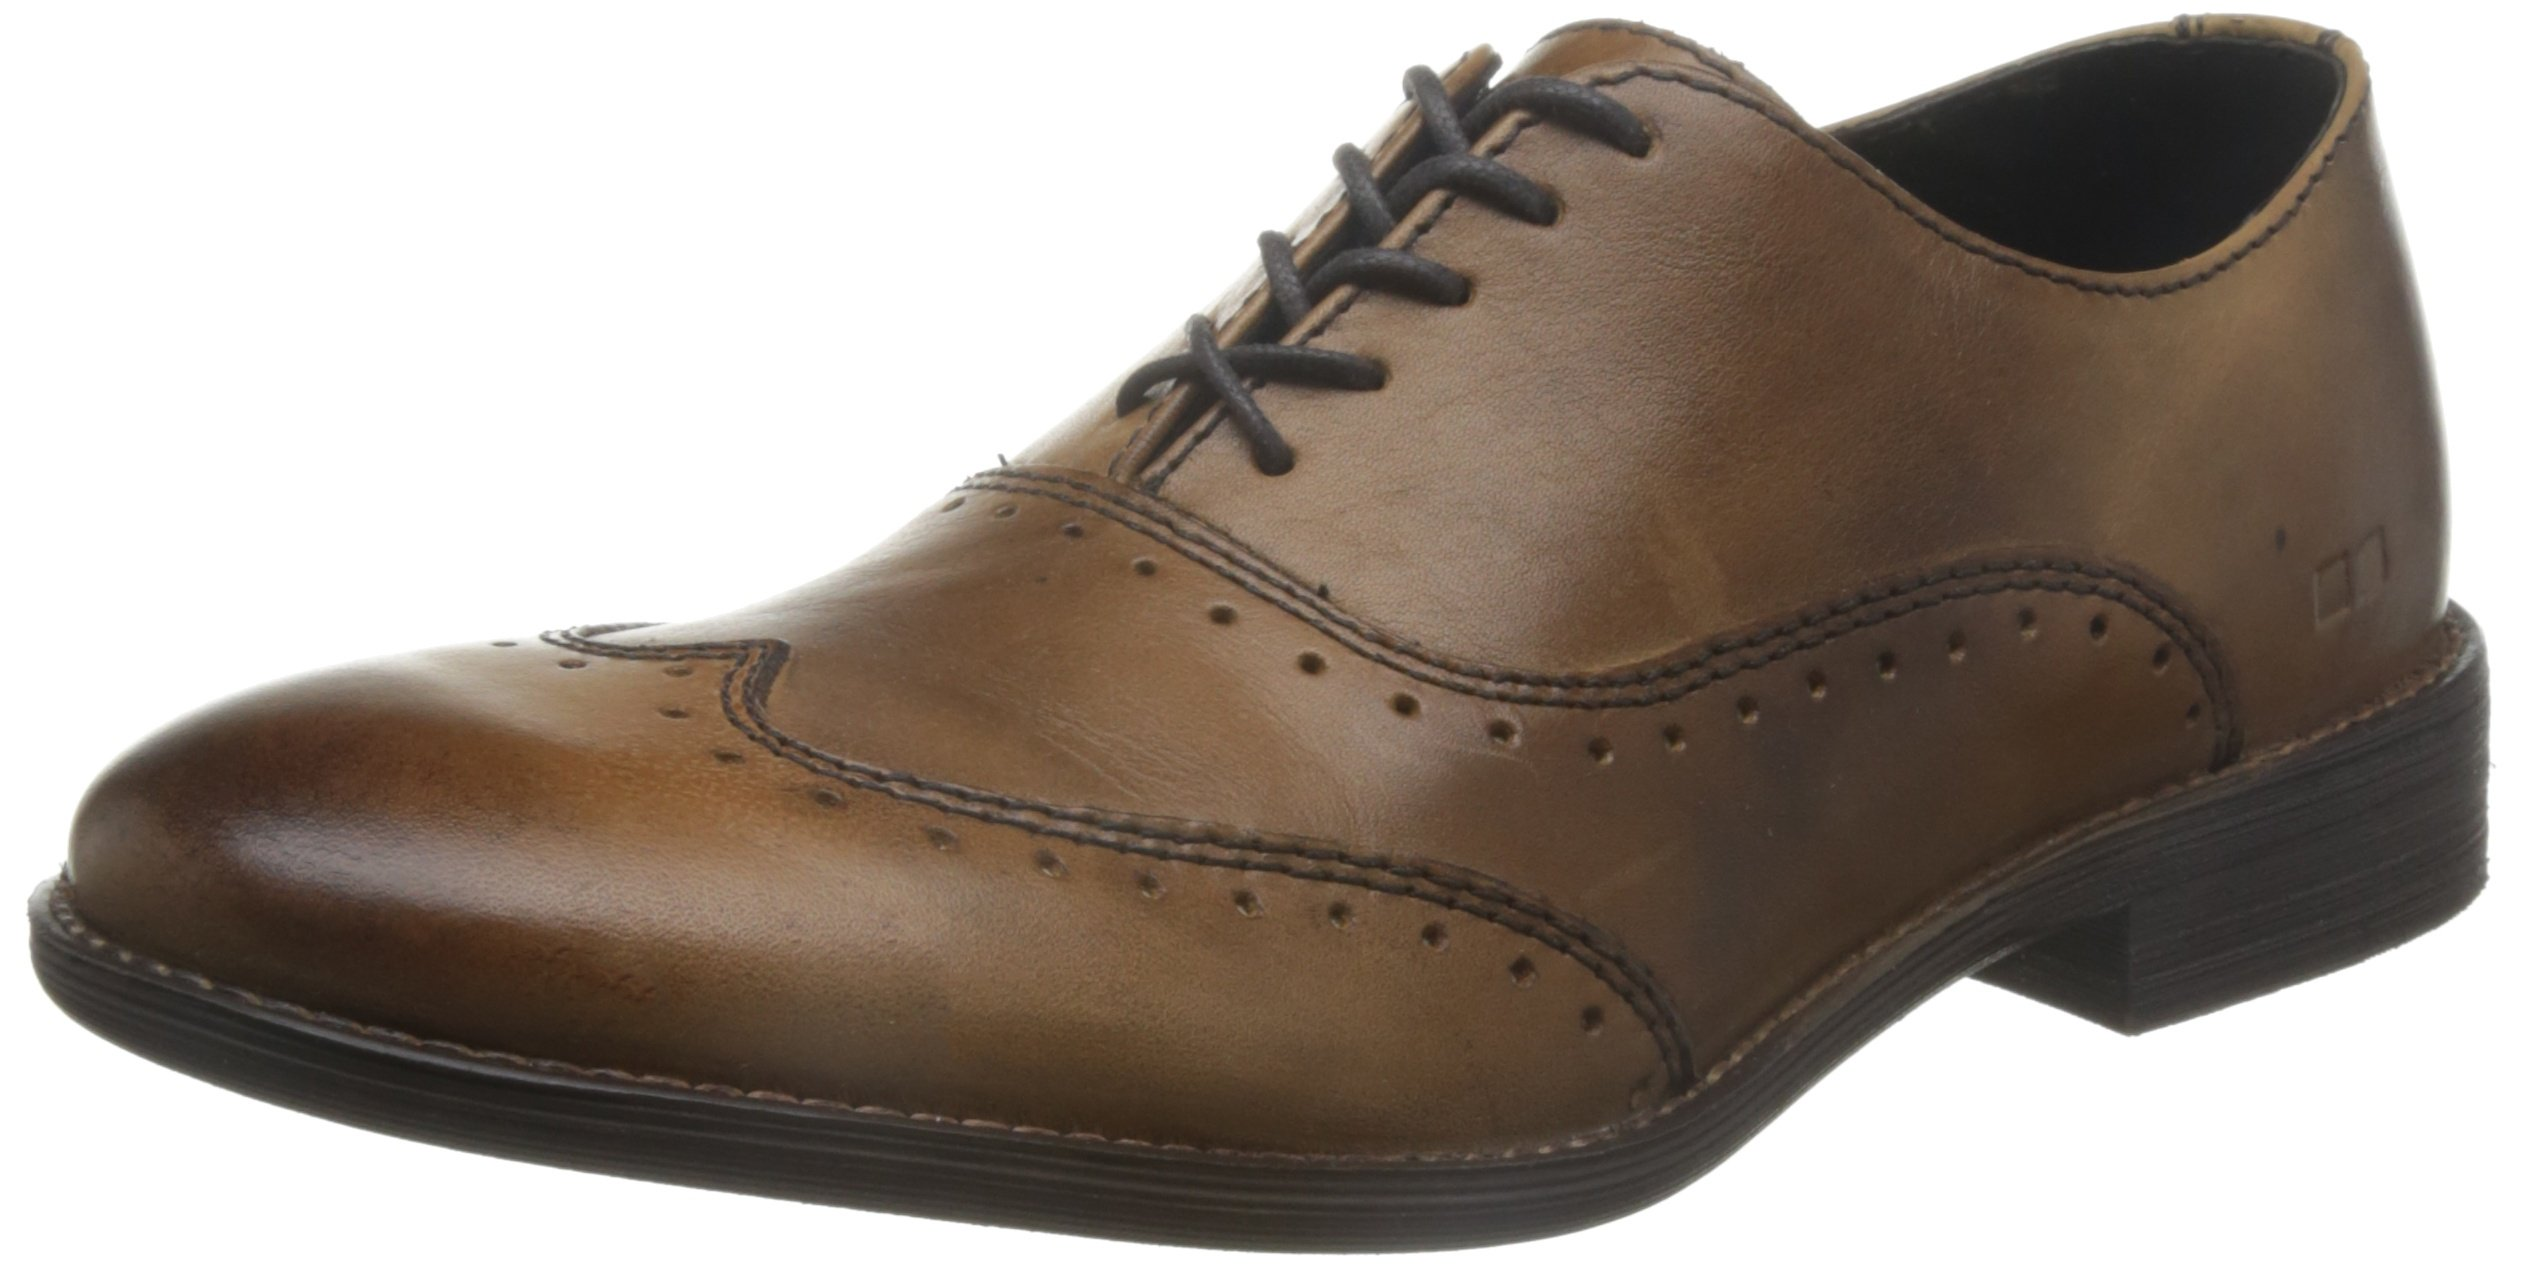 Bed|Stu Men's George Oxford, Tan Glove, 8.5 M US